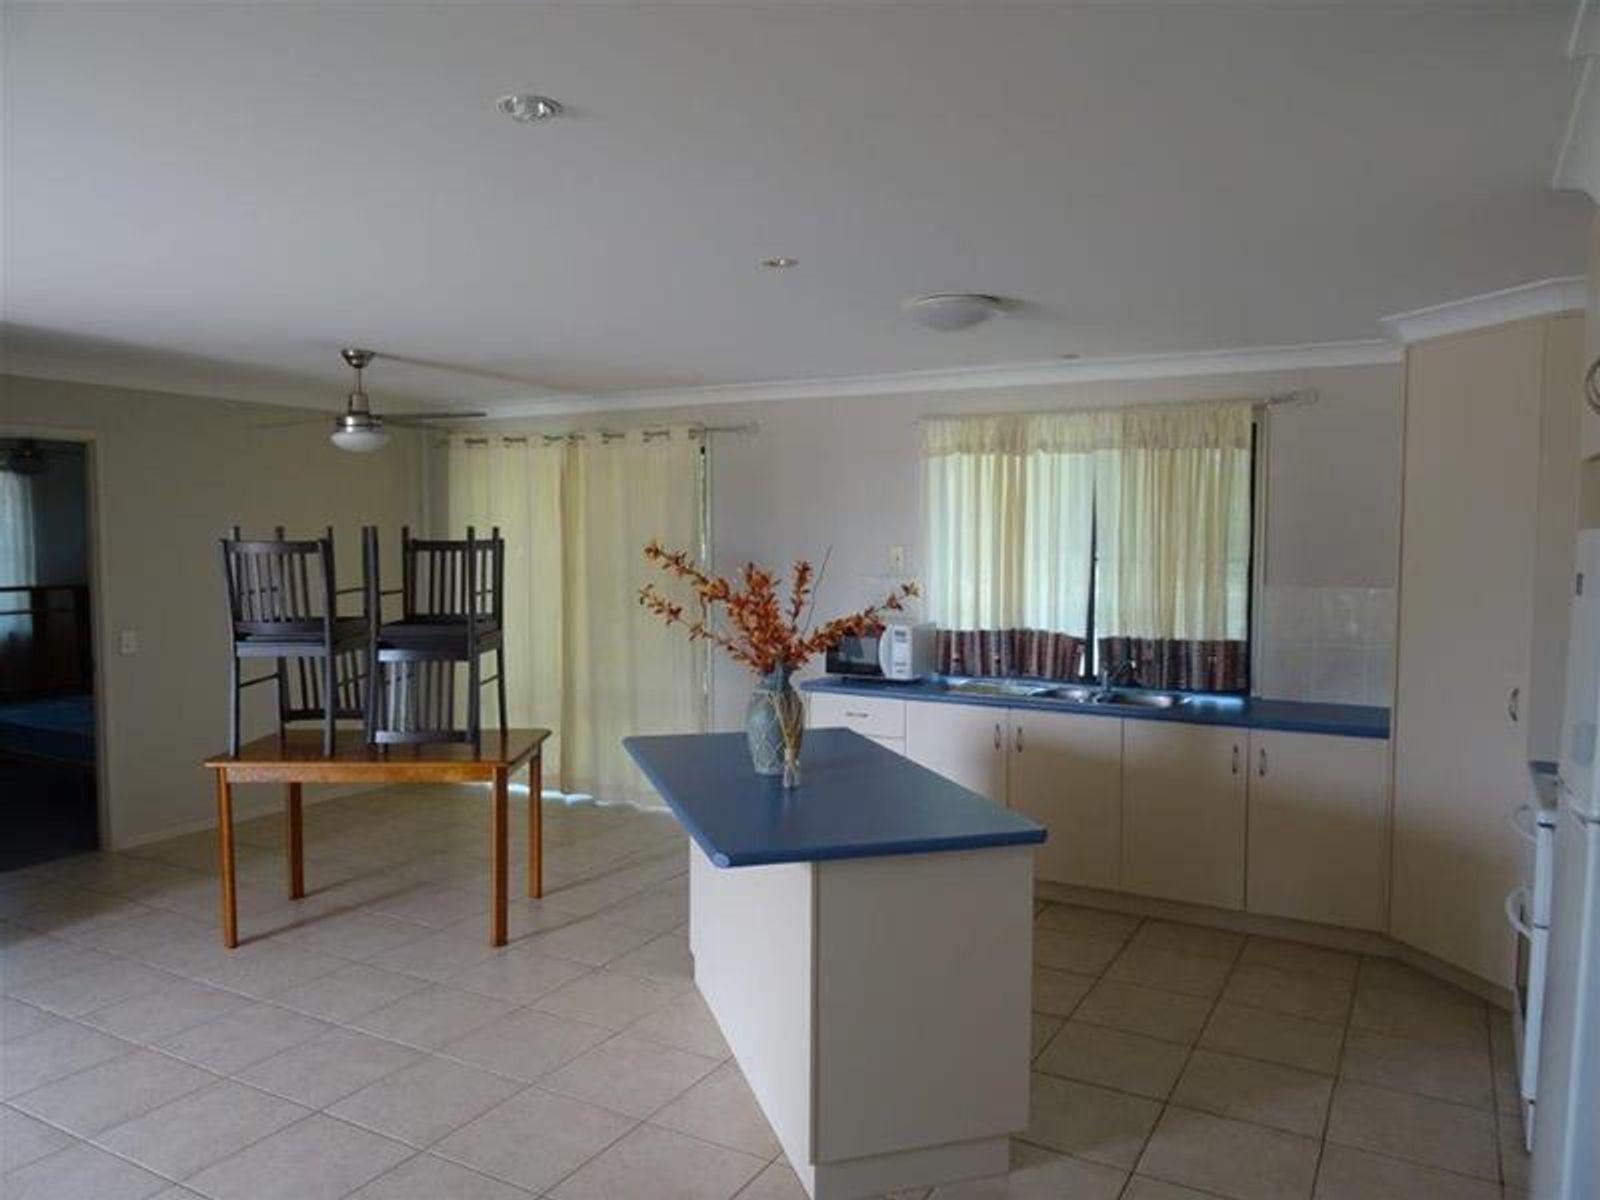 16 Cassia Court, Nebo, QLD 4742